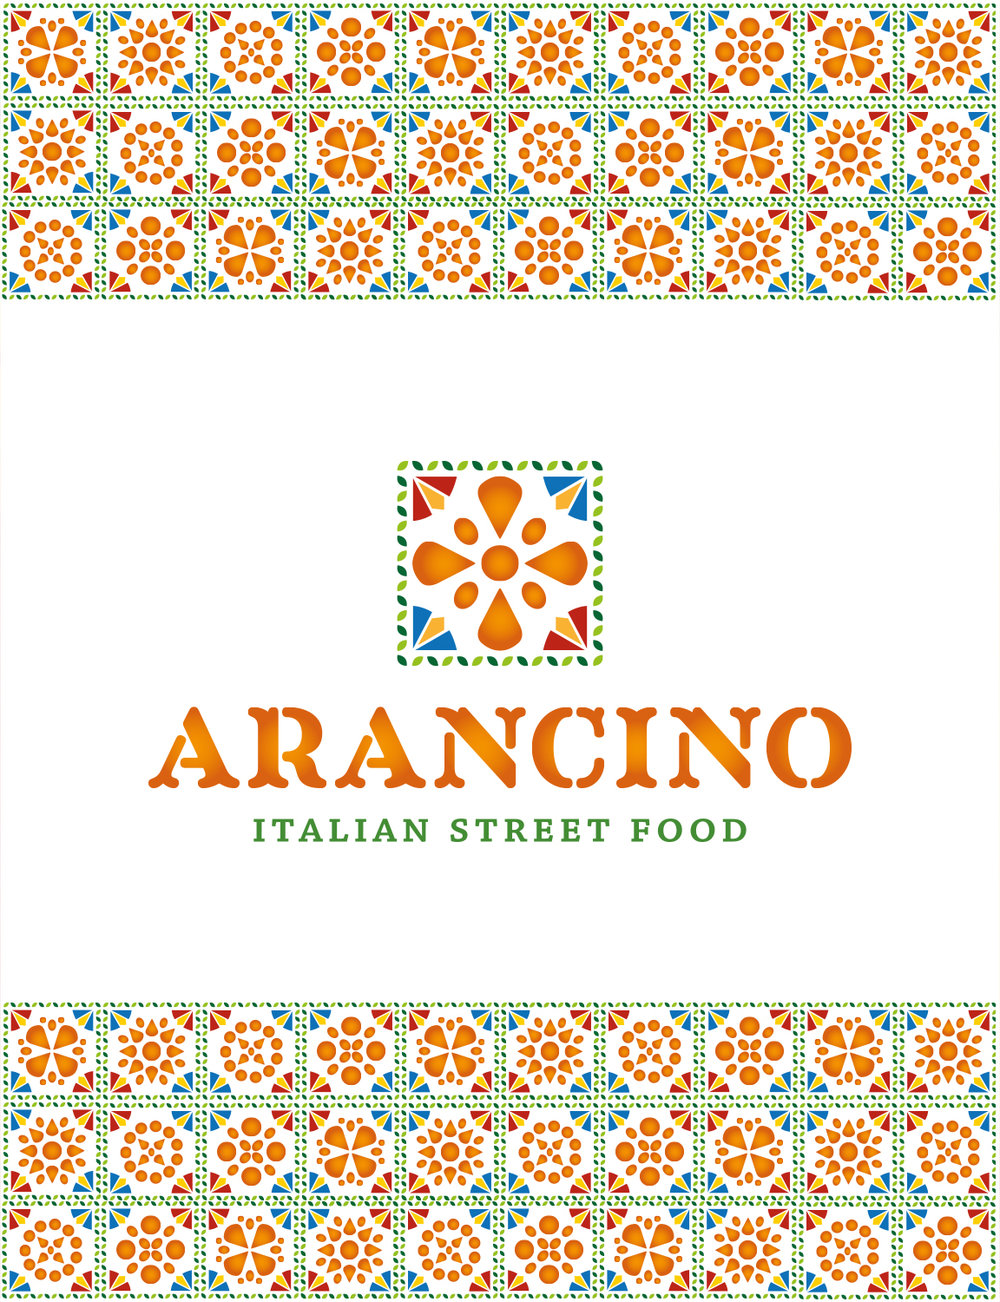 intro-branding-arancino-eleonora-majorana-luxembourg.jpg